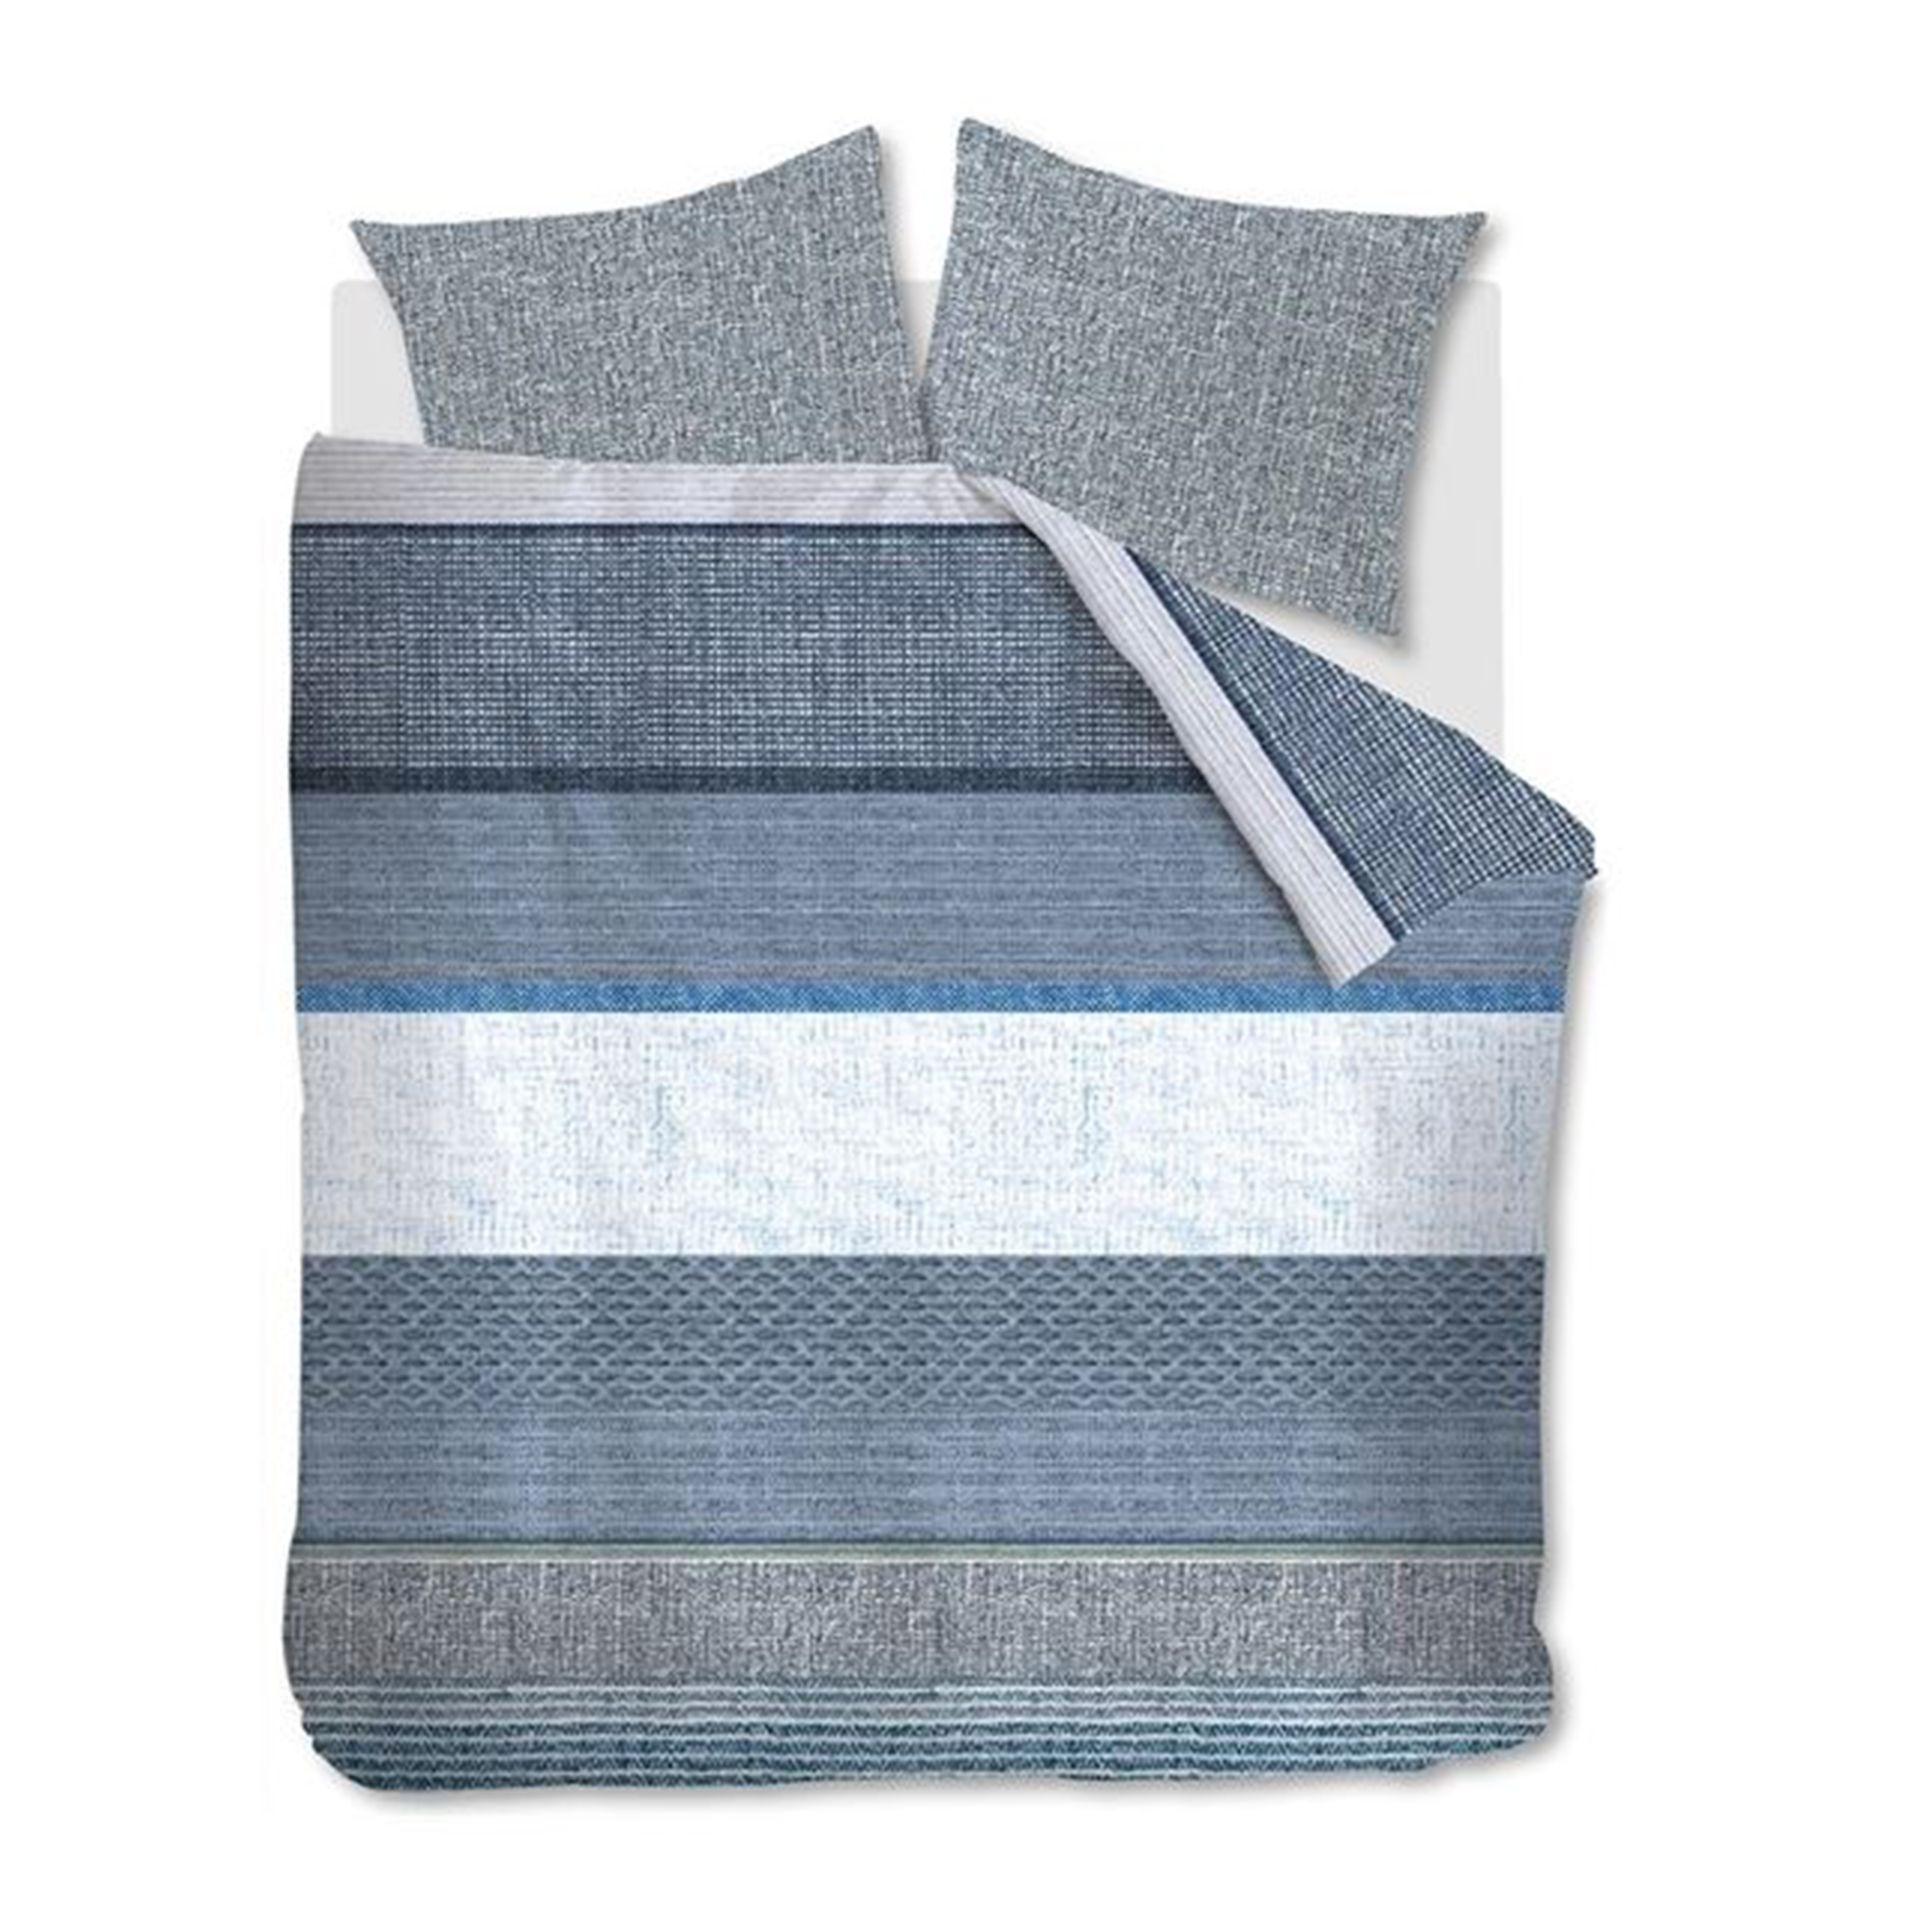 Beddinghouse - Bodhi blue dekbedovertrek